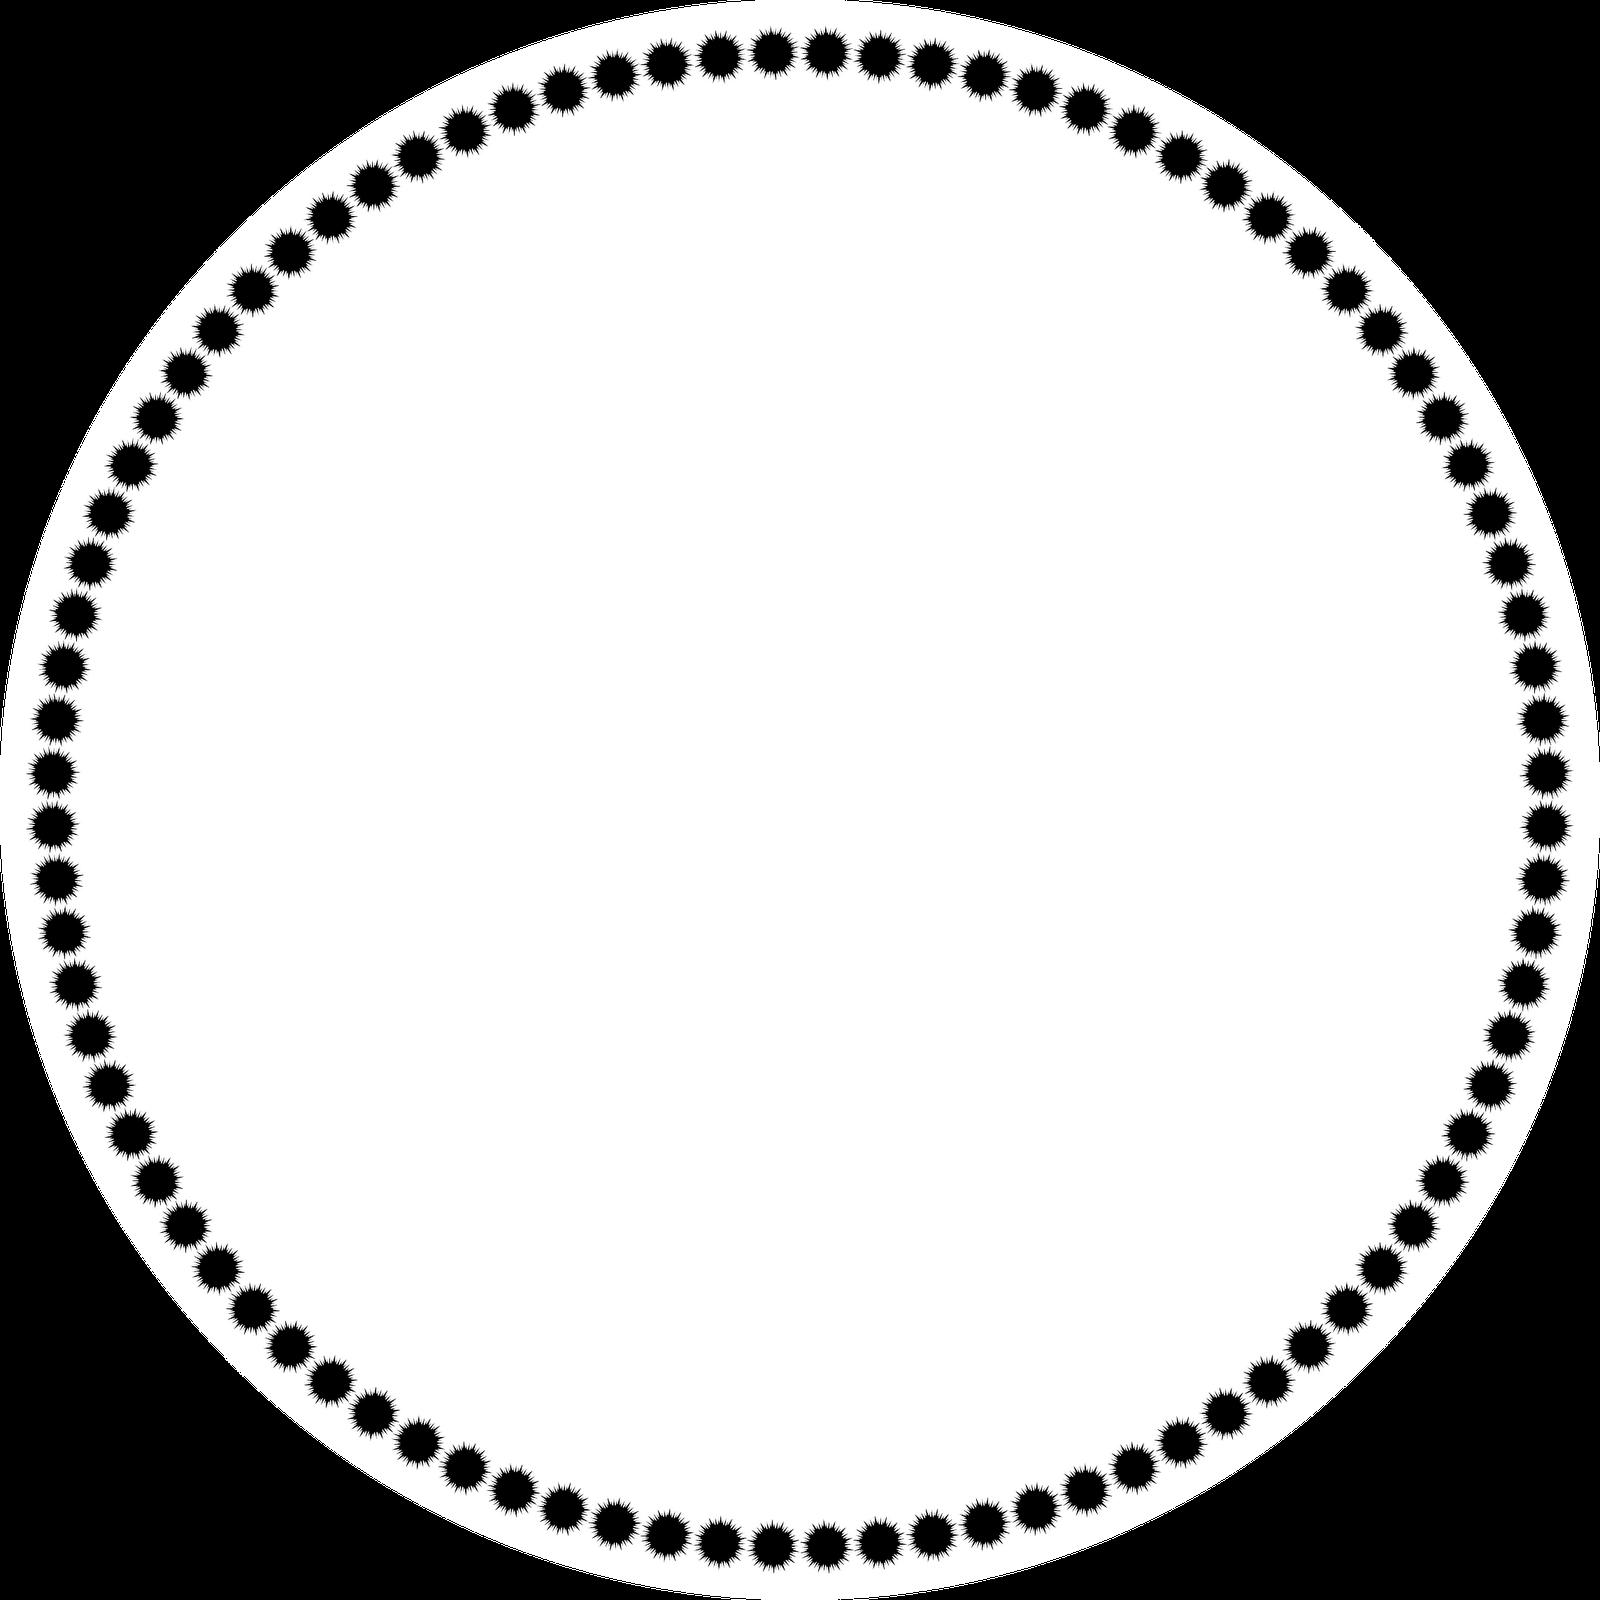 Circle clipart clear background. Black transparent